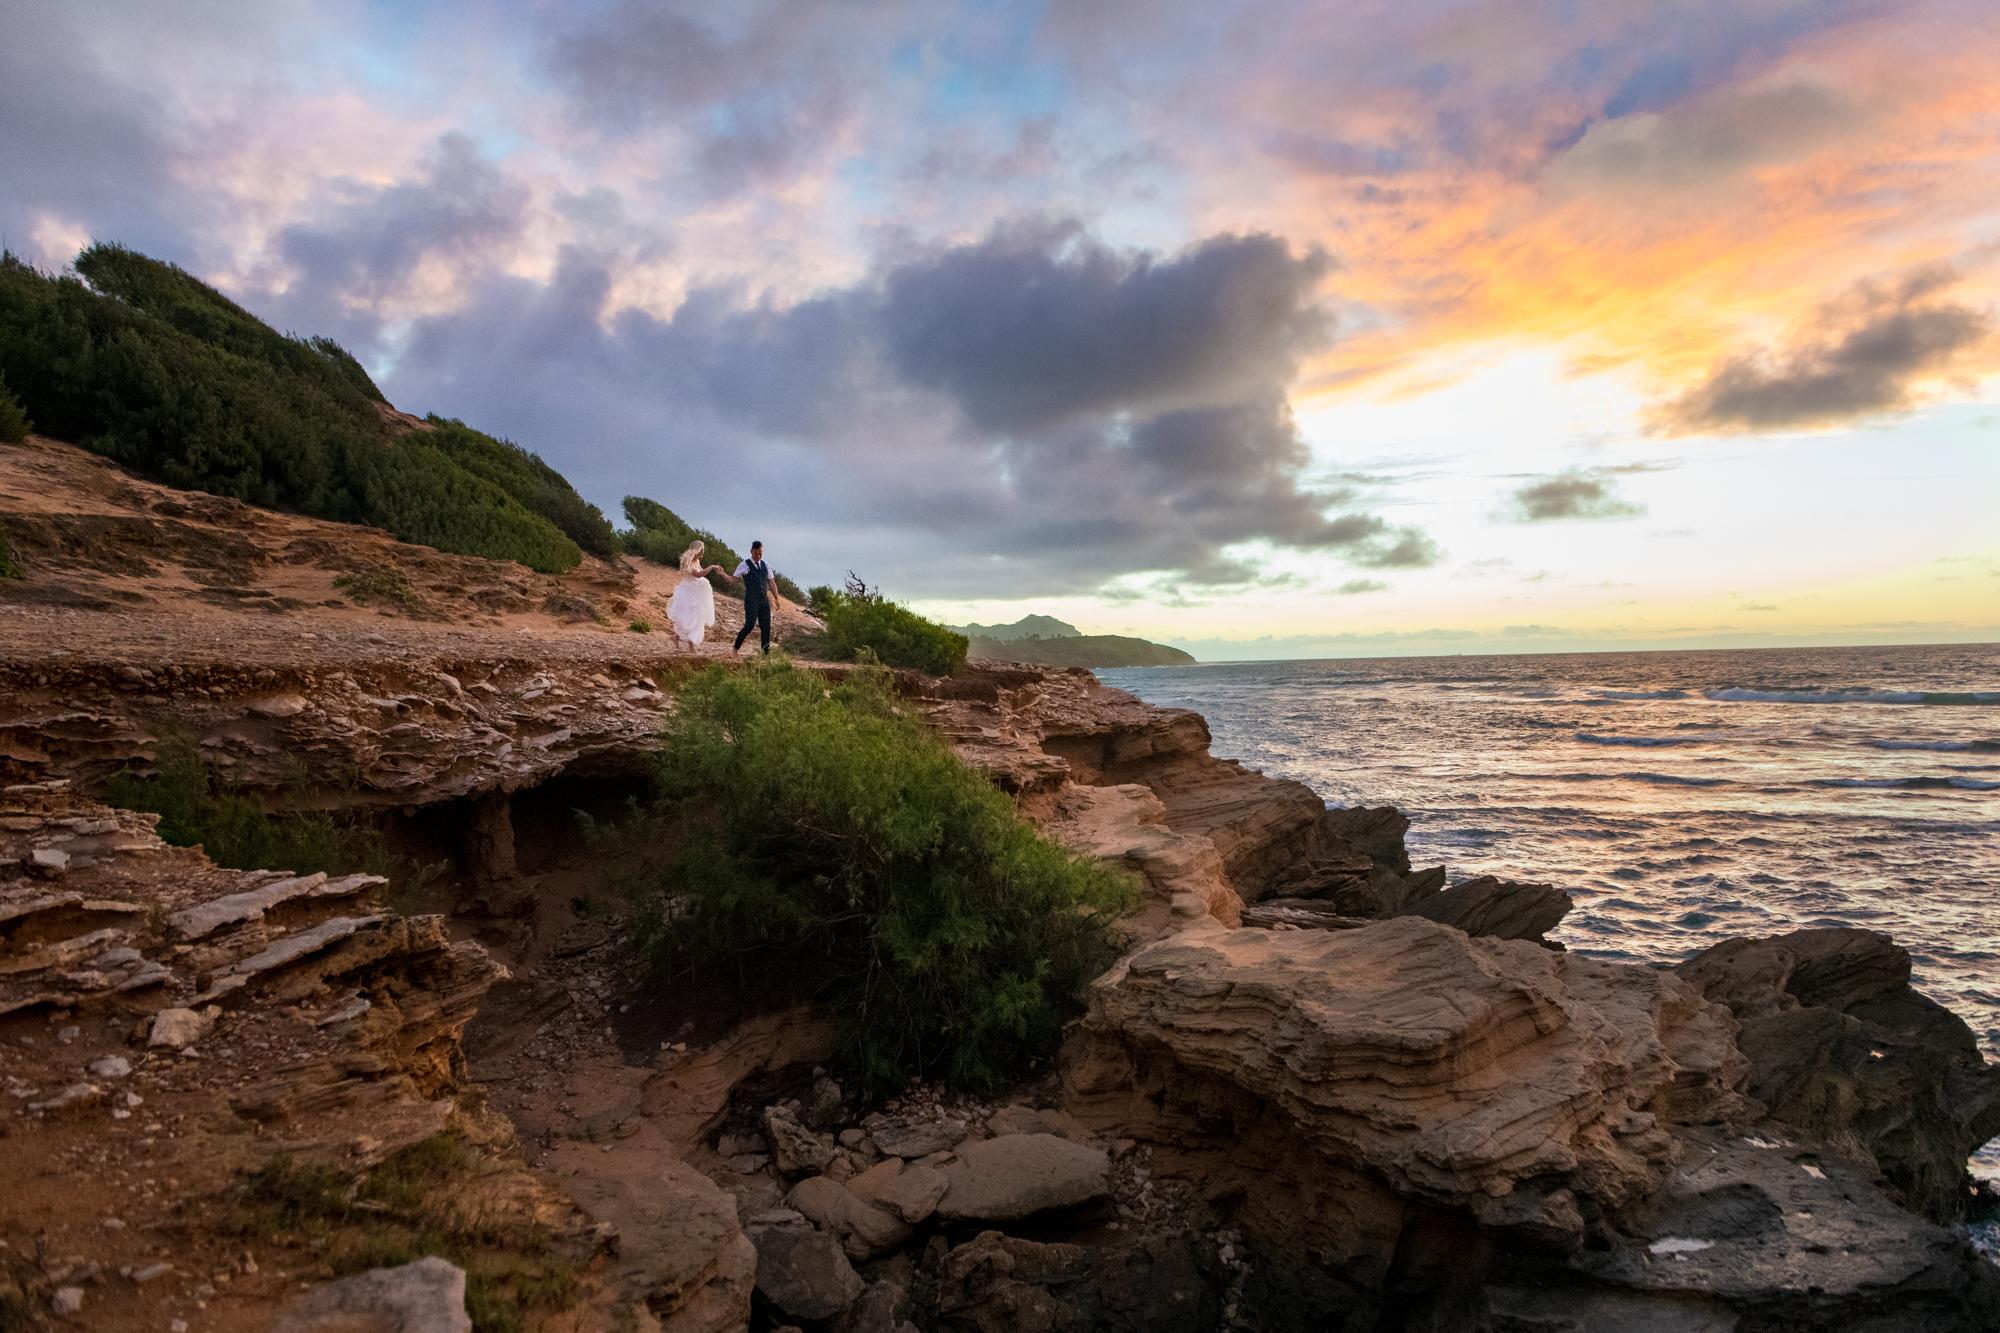 sunrise-wedding-coleen-shipwrecks-6-29-2919-8913.jpg